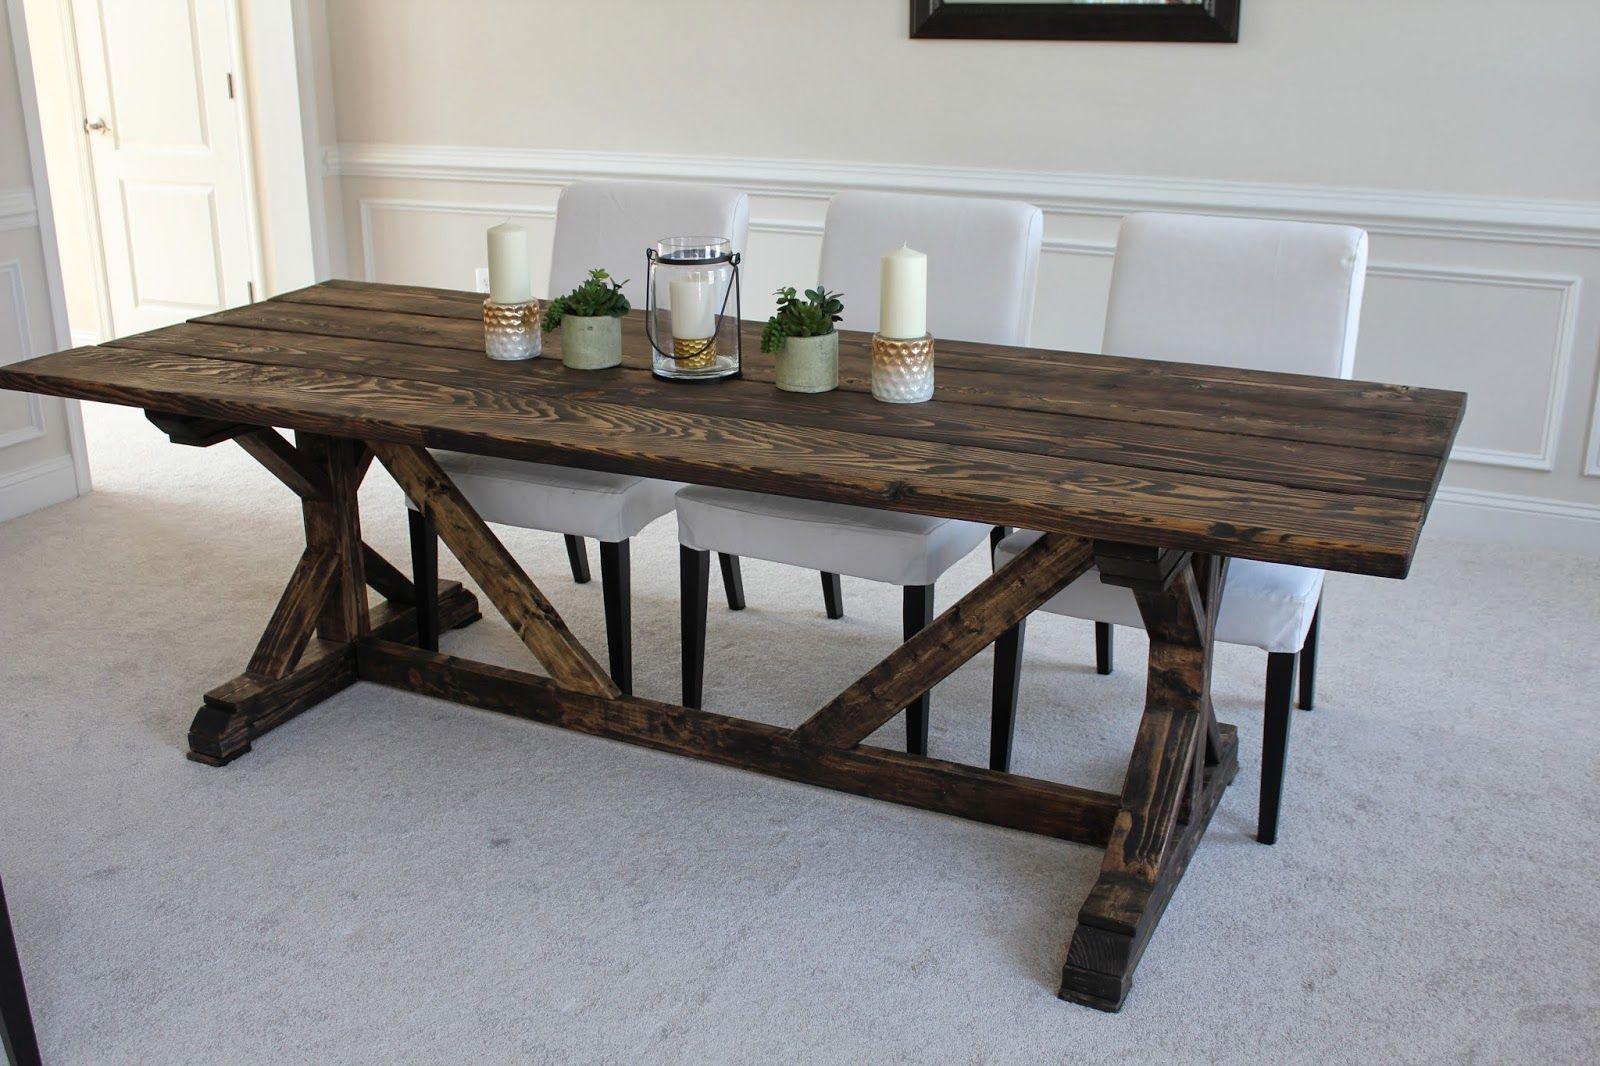 Wooden Farmhouse Table Plans DIY blueprints Farmhouse